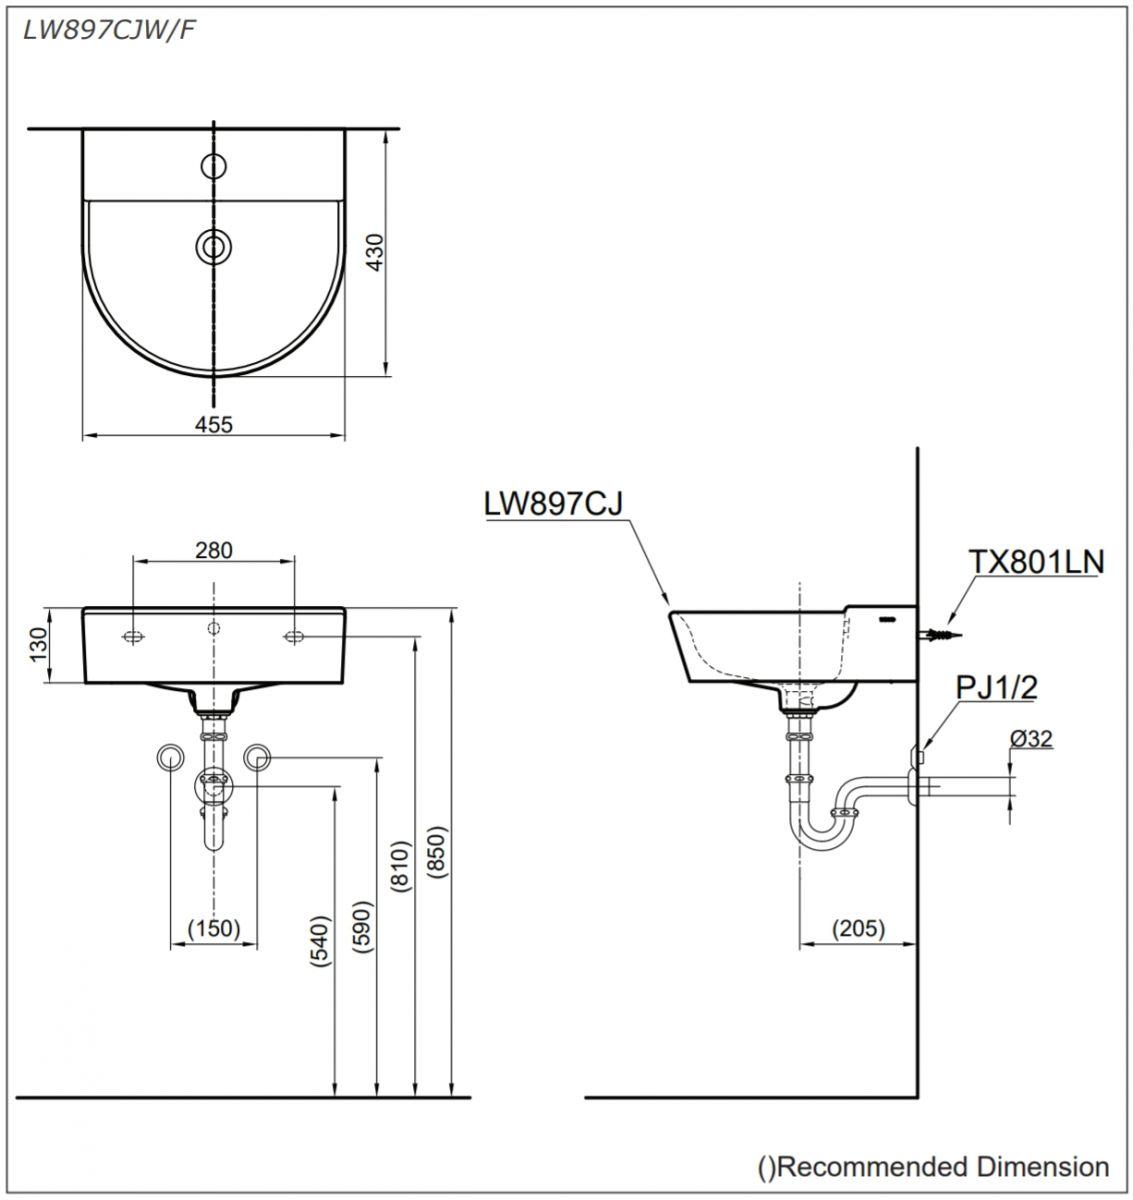 bản vẽ kĩ thuật lavabo treo tường toto LW897CJW/F